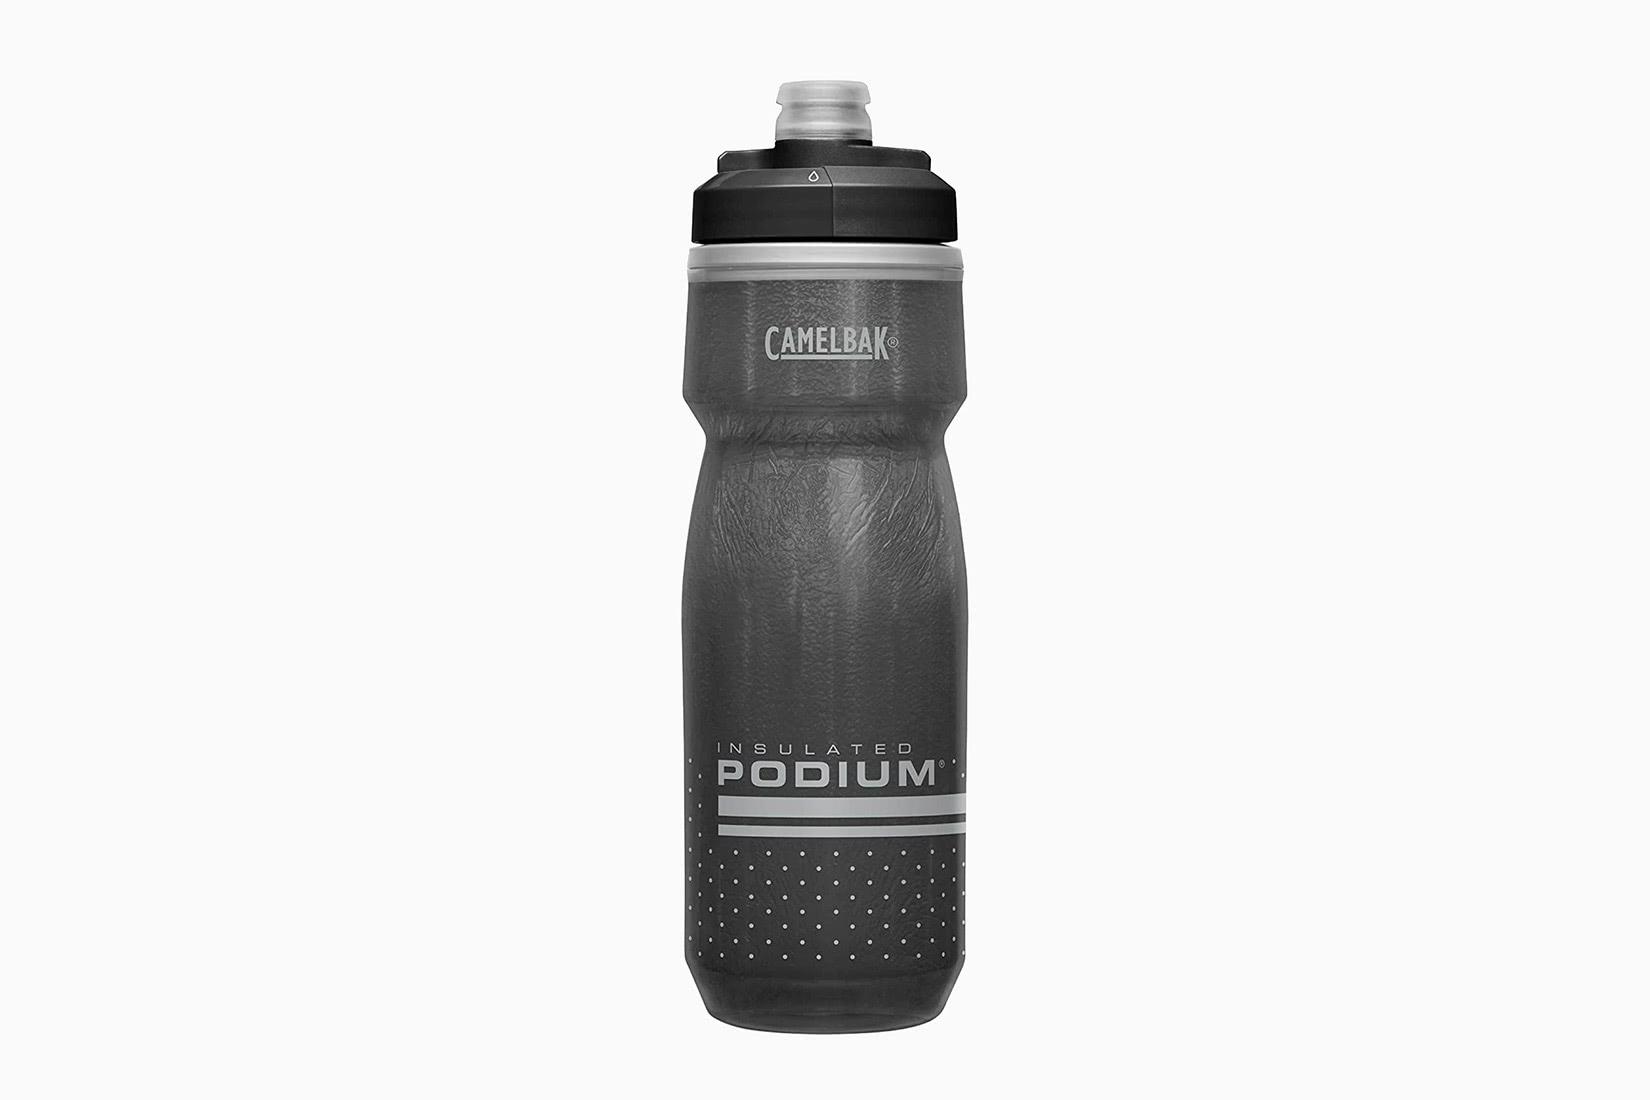 best water bottles bike camelbak podium - Luxe Digital